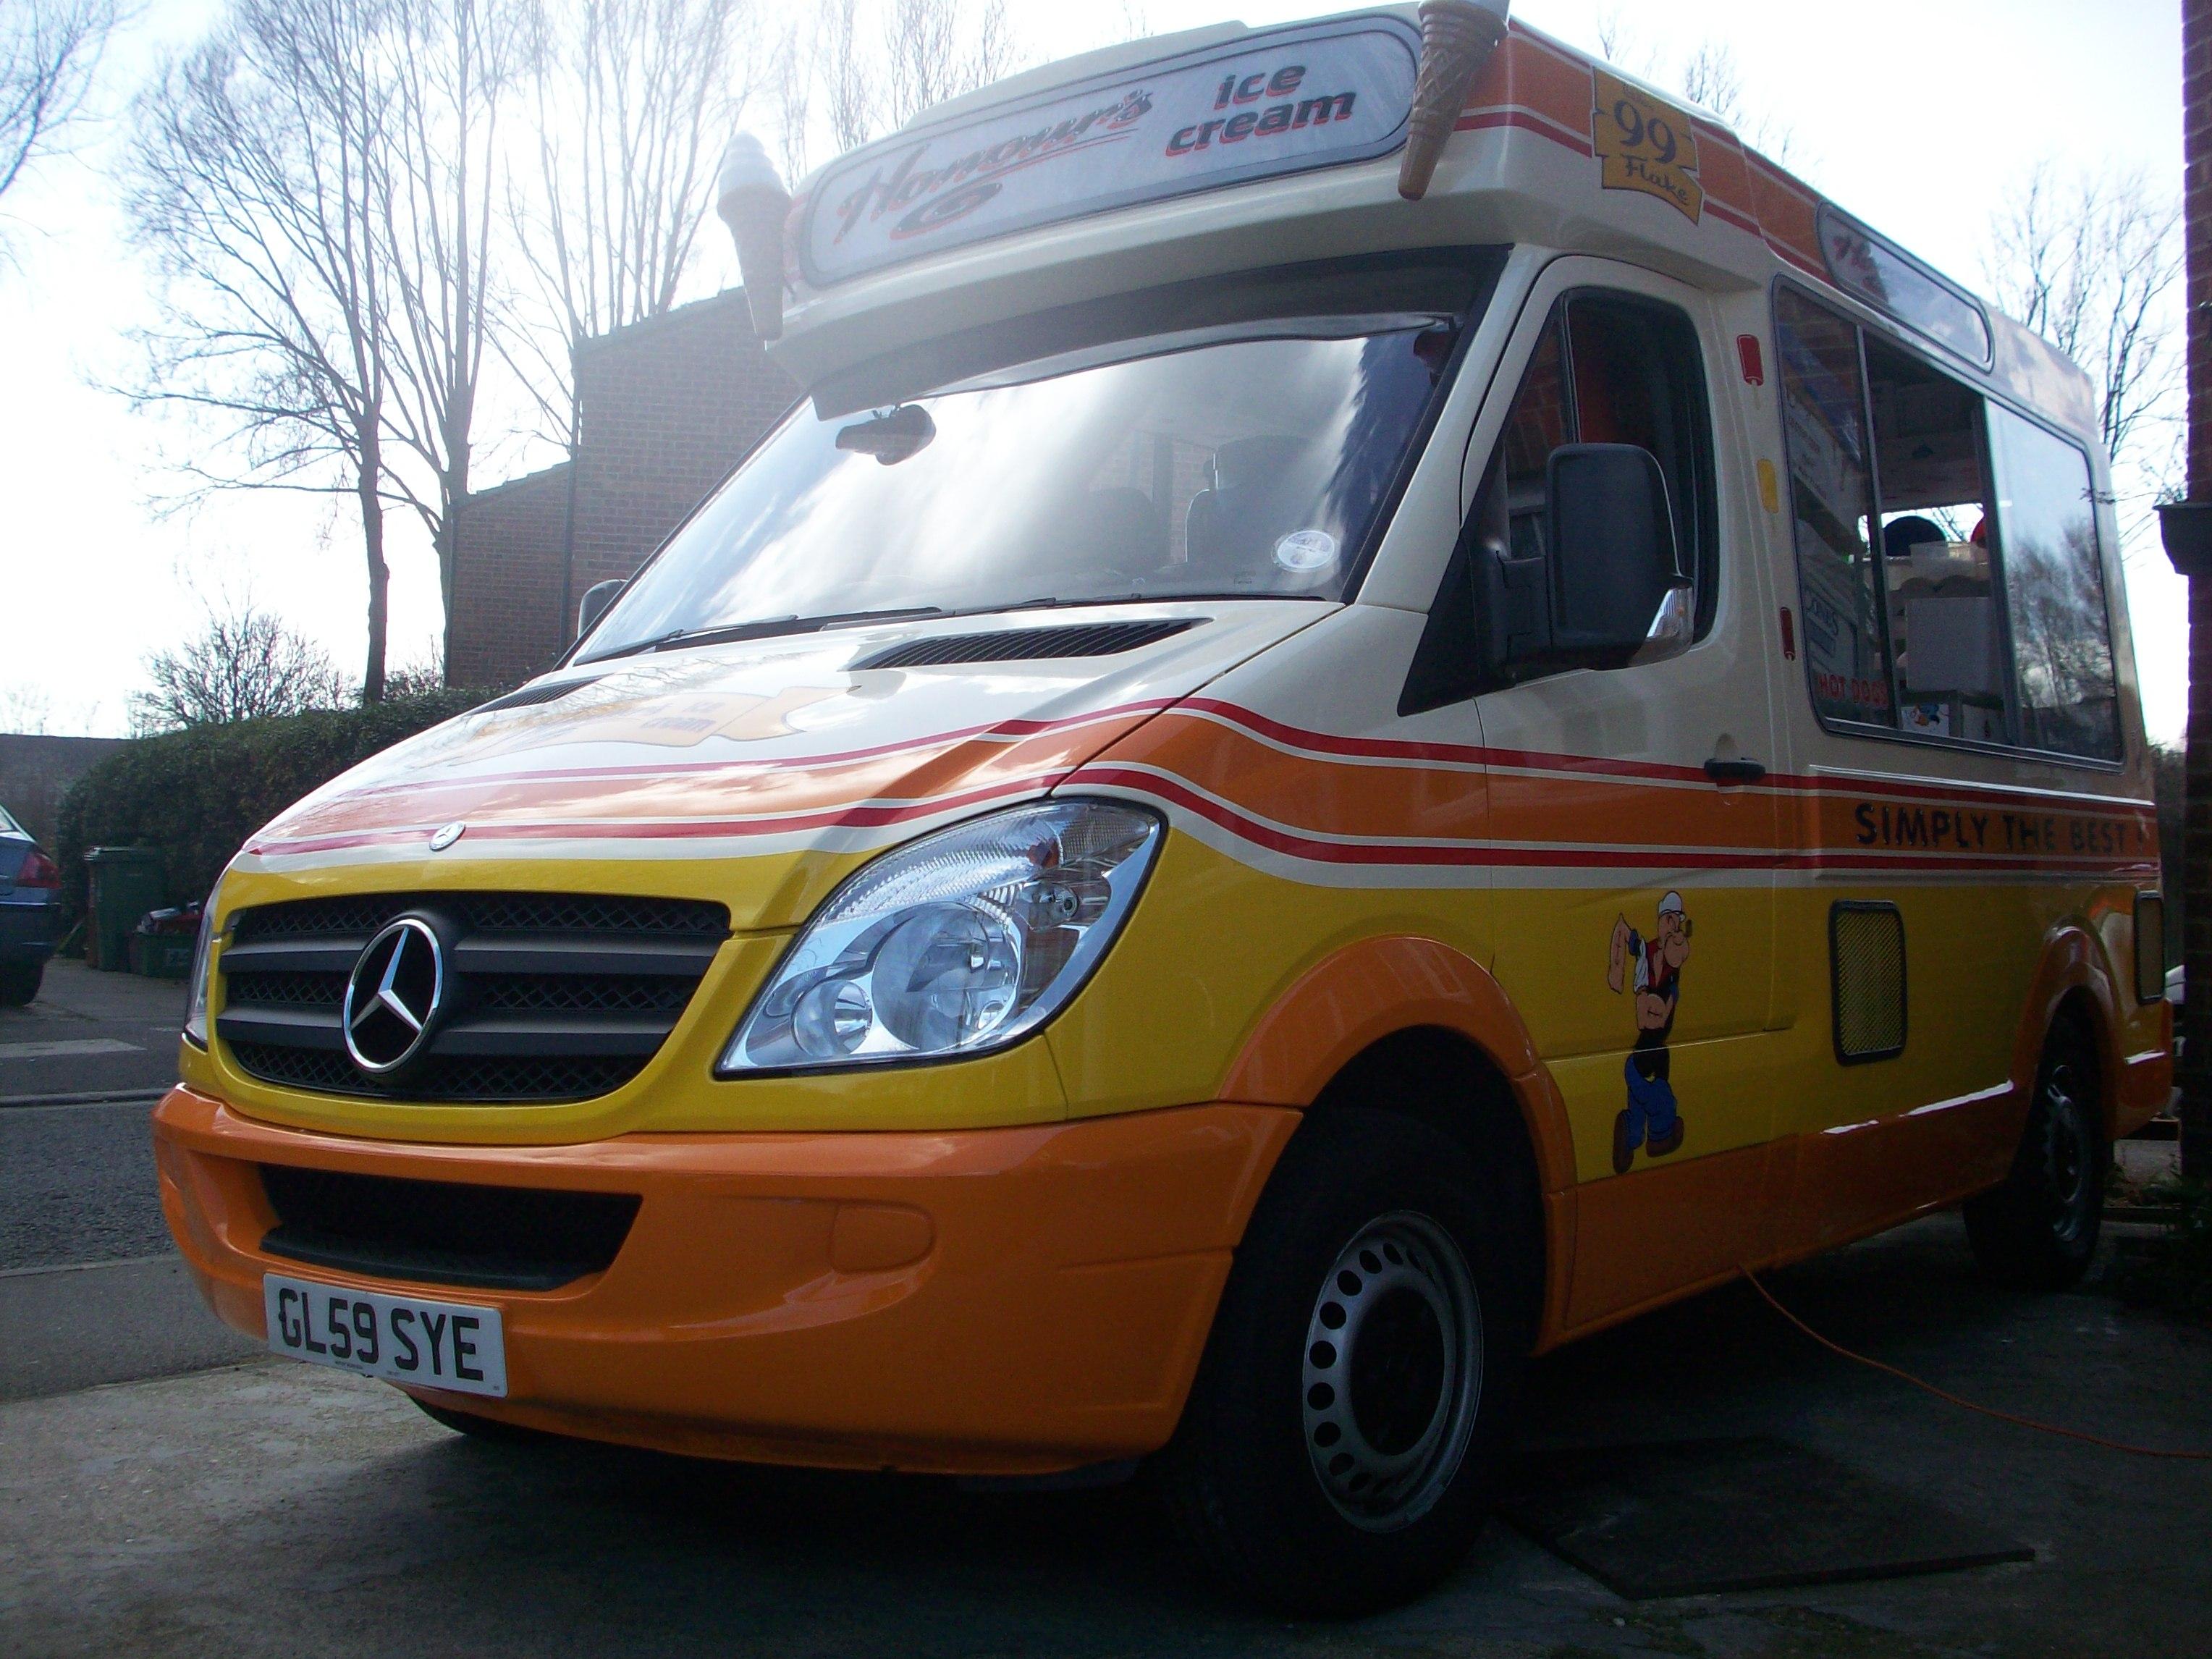 Honours Sprinter ice cream van converted 2012 Whitby Morrison